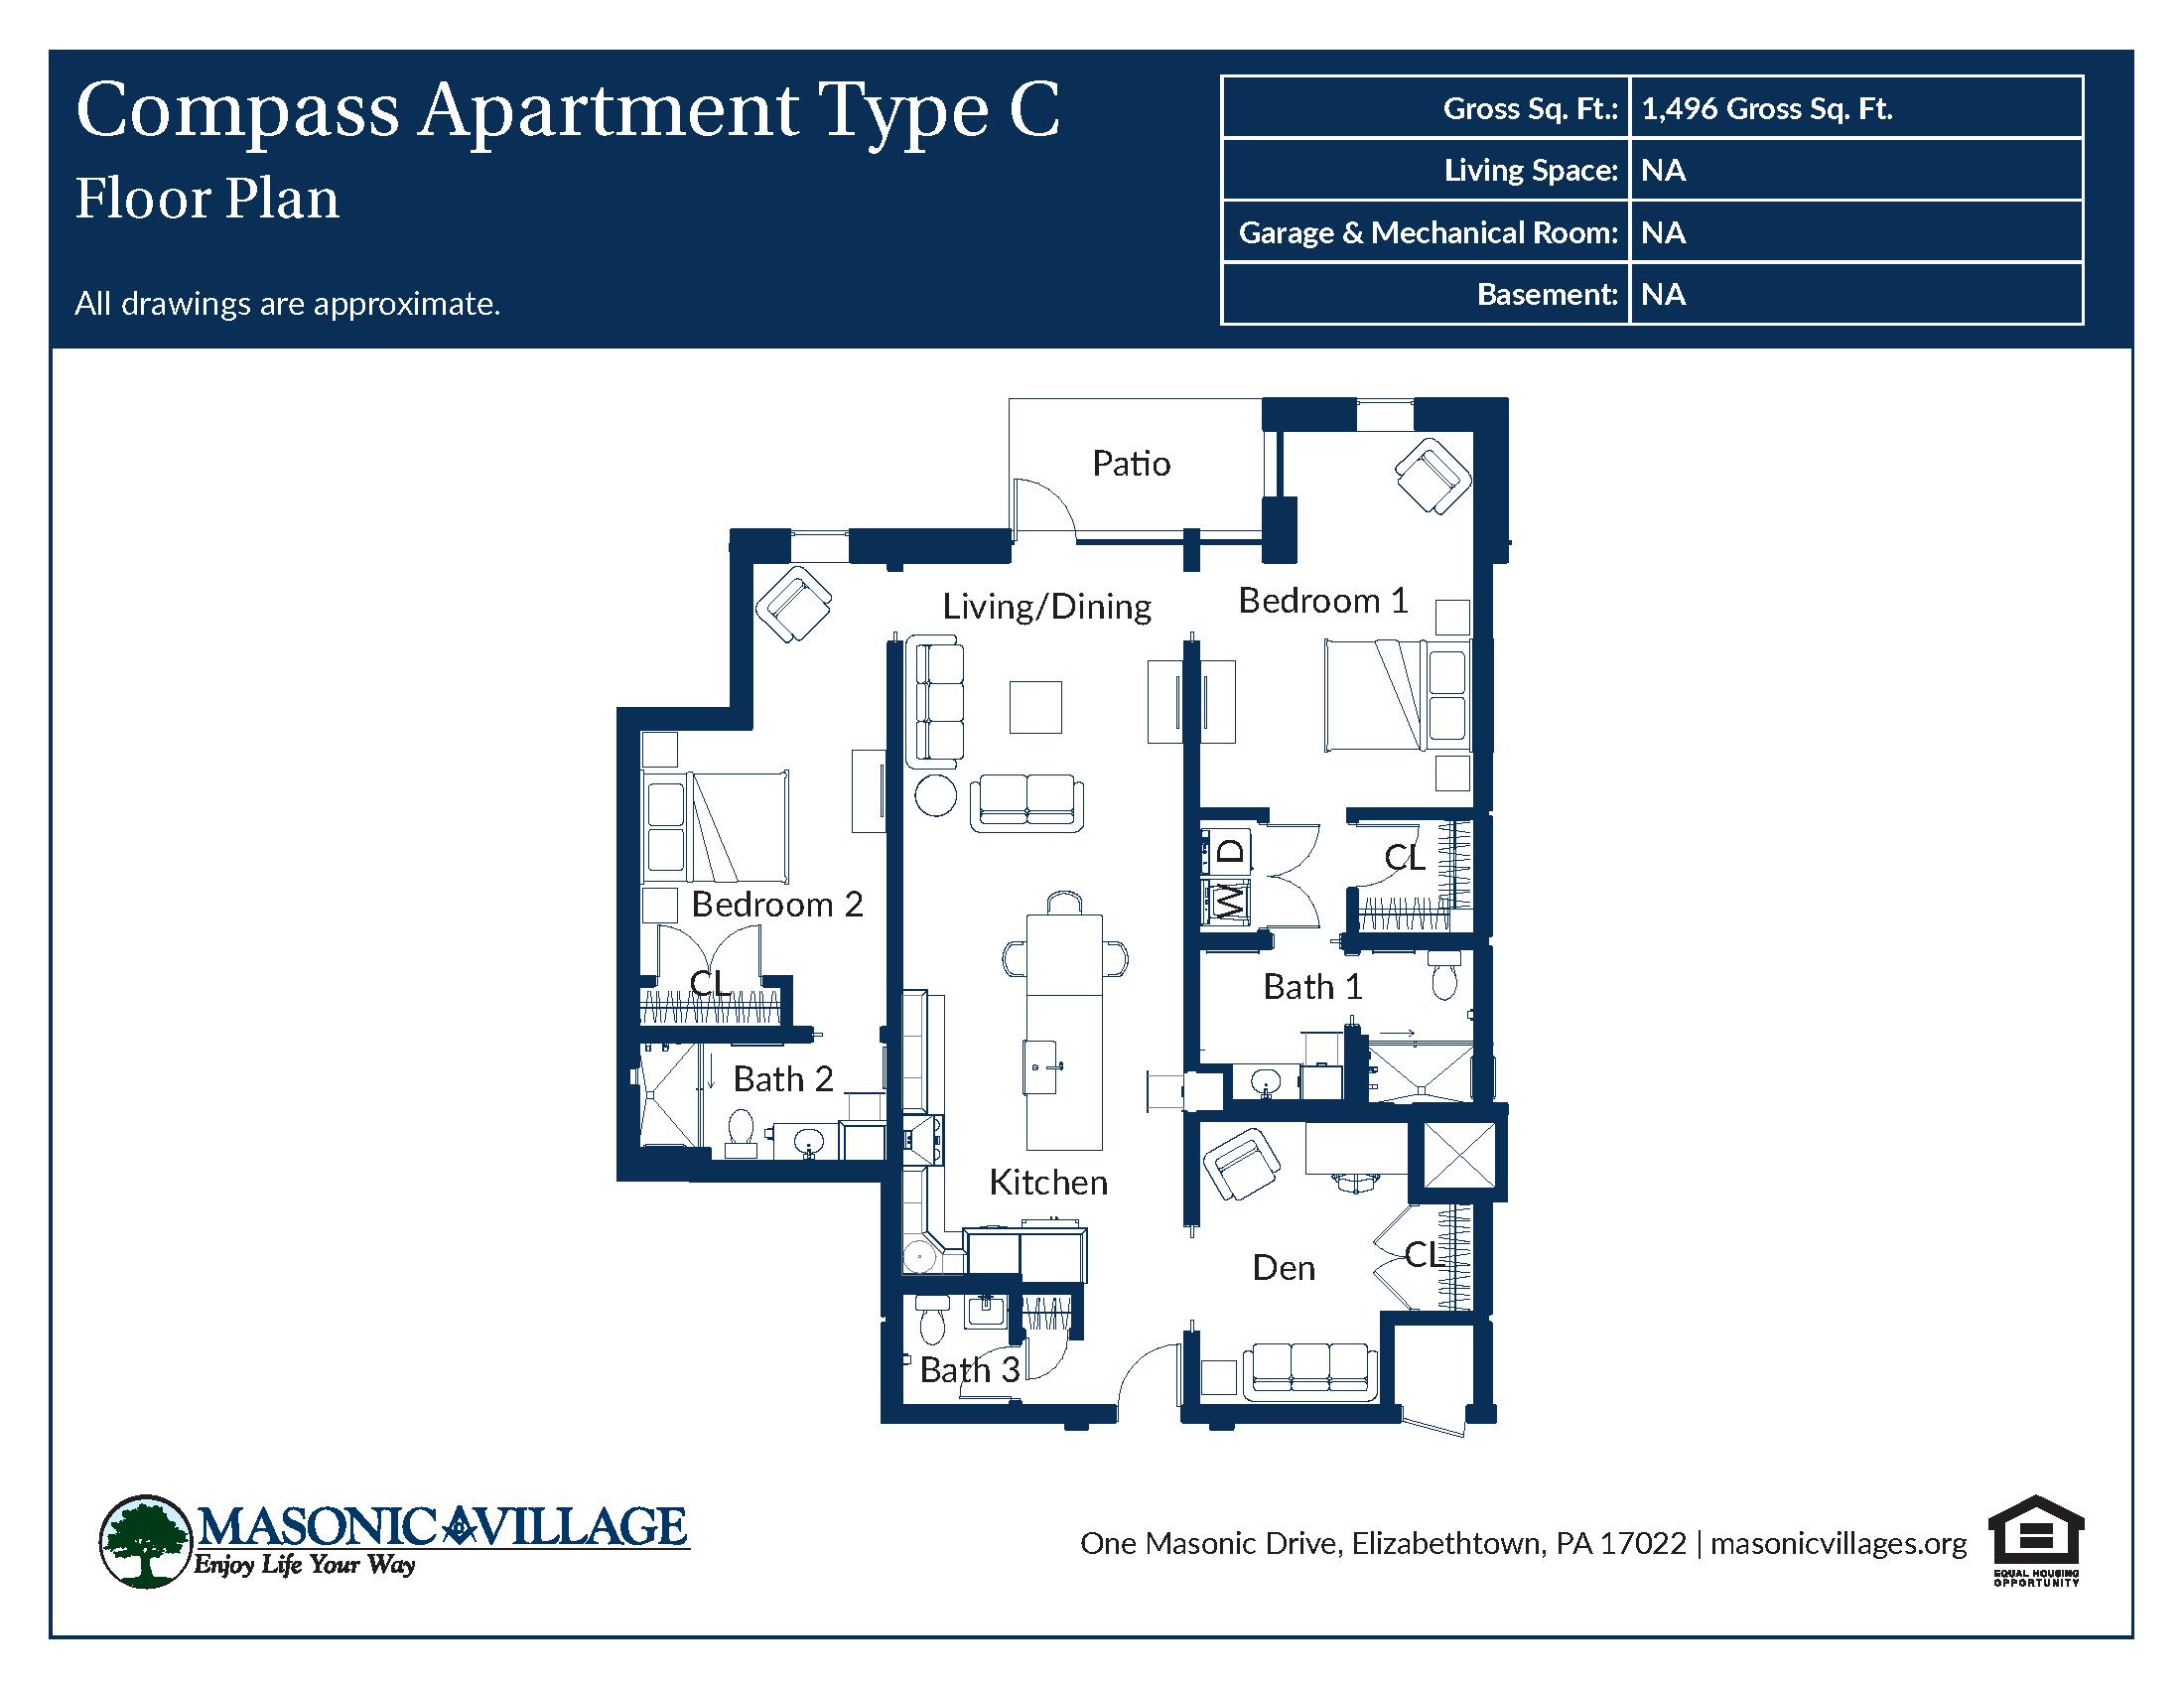 Masonic Village at Elizabethtown - Compass Apartment C Floor Plan